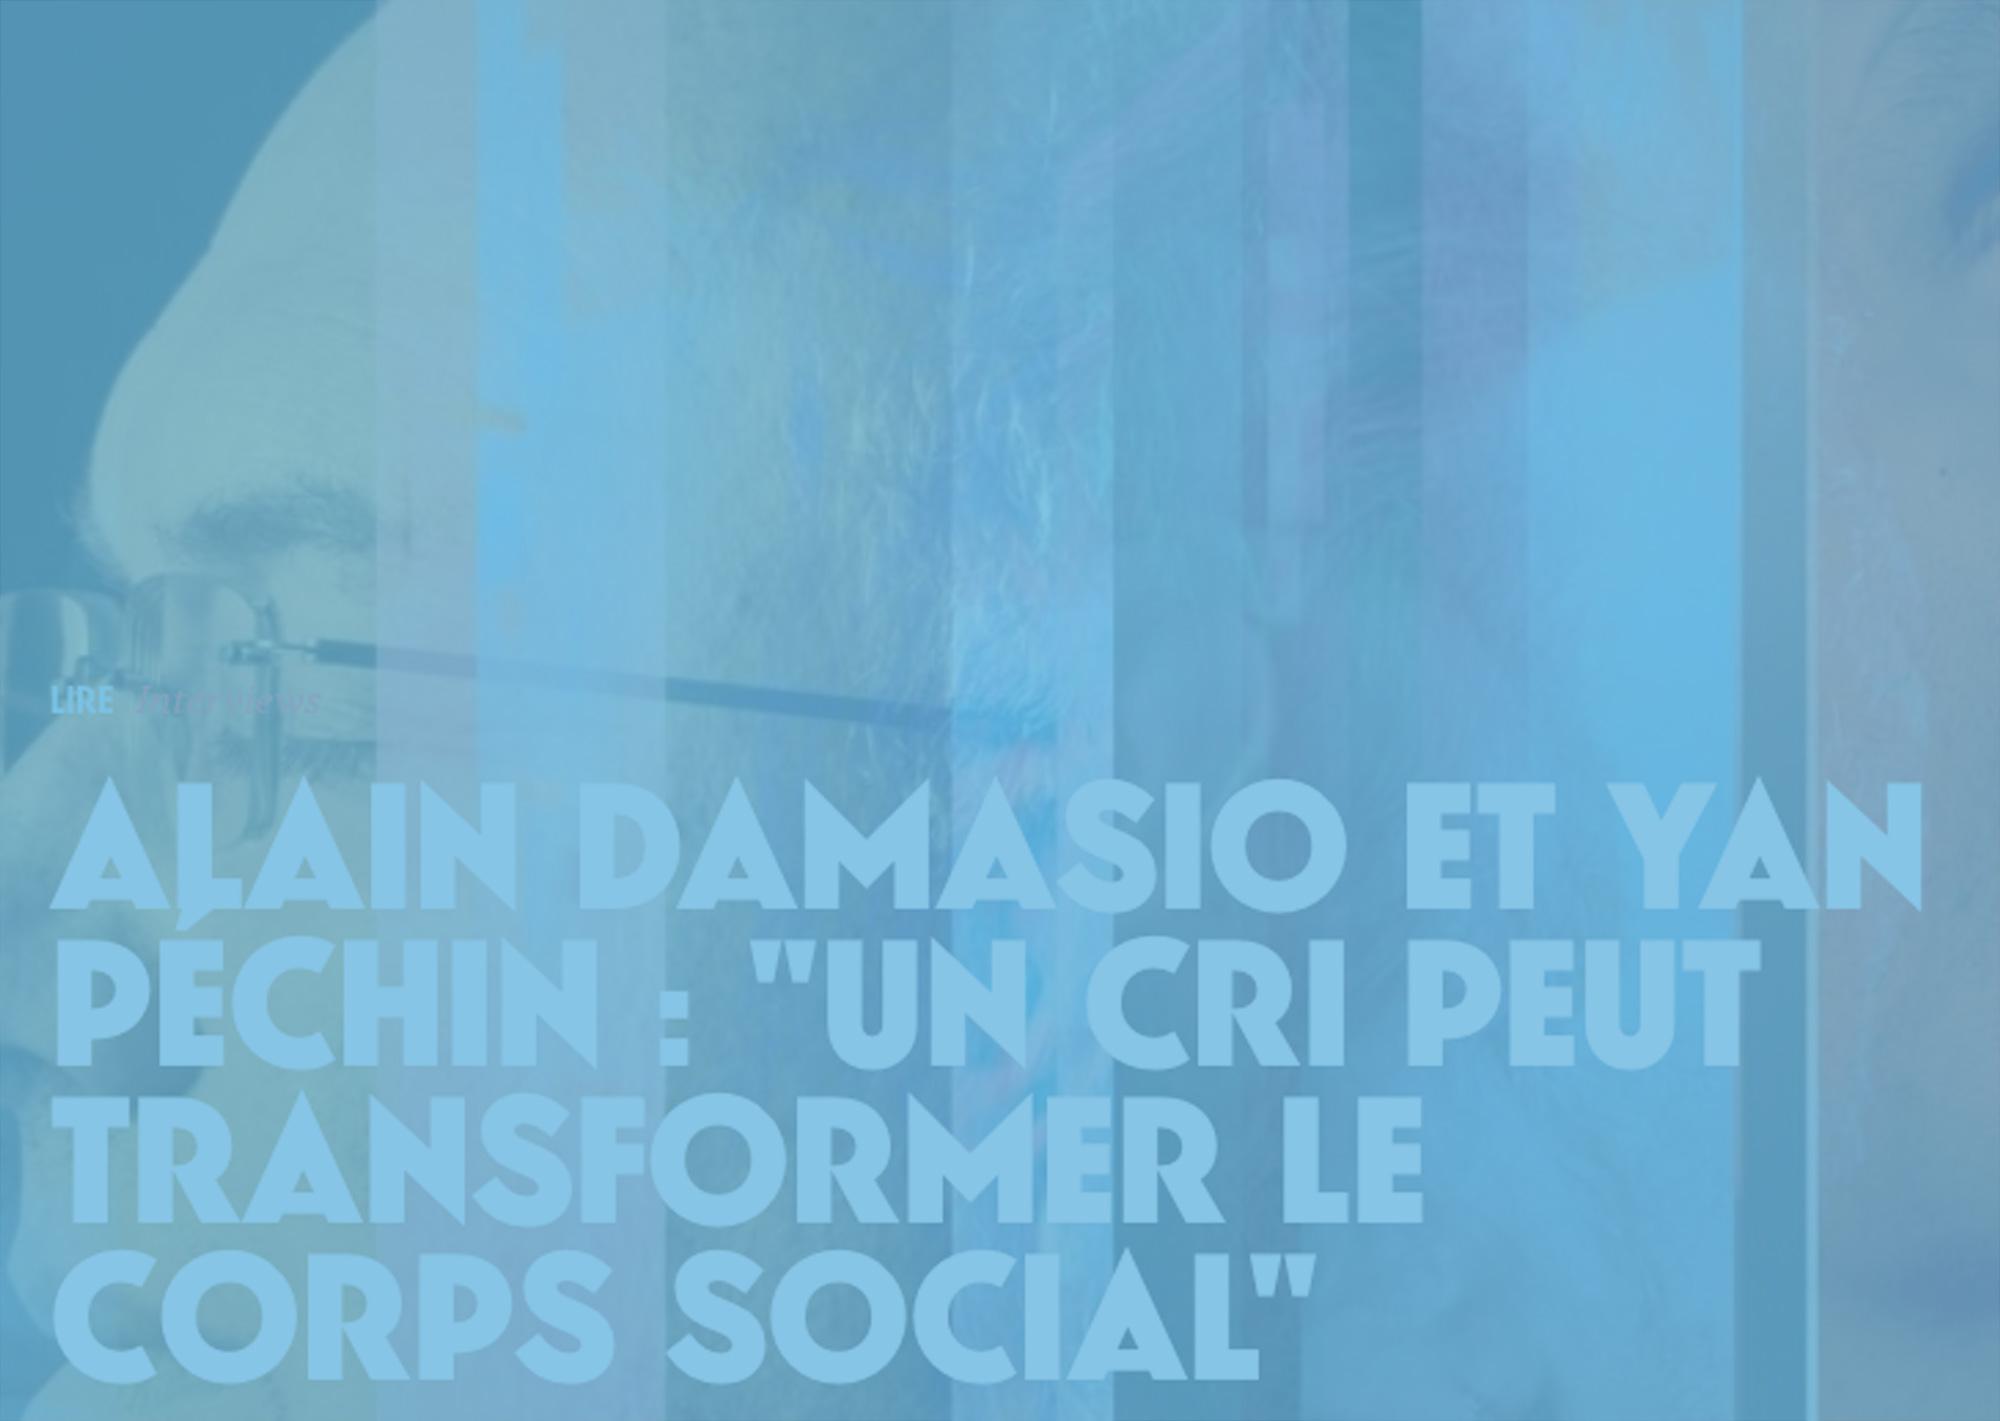 Un cri peut transformer le corps social – Sourdoreille